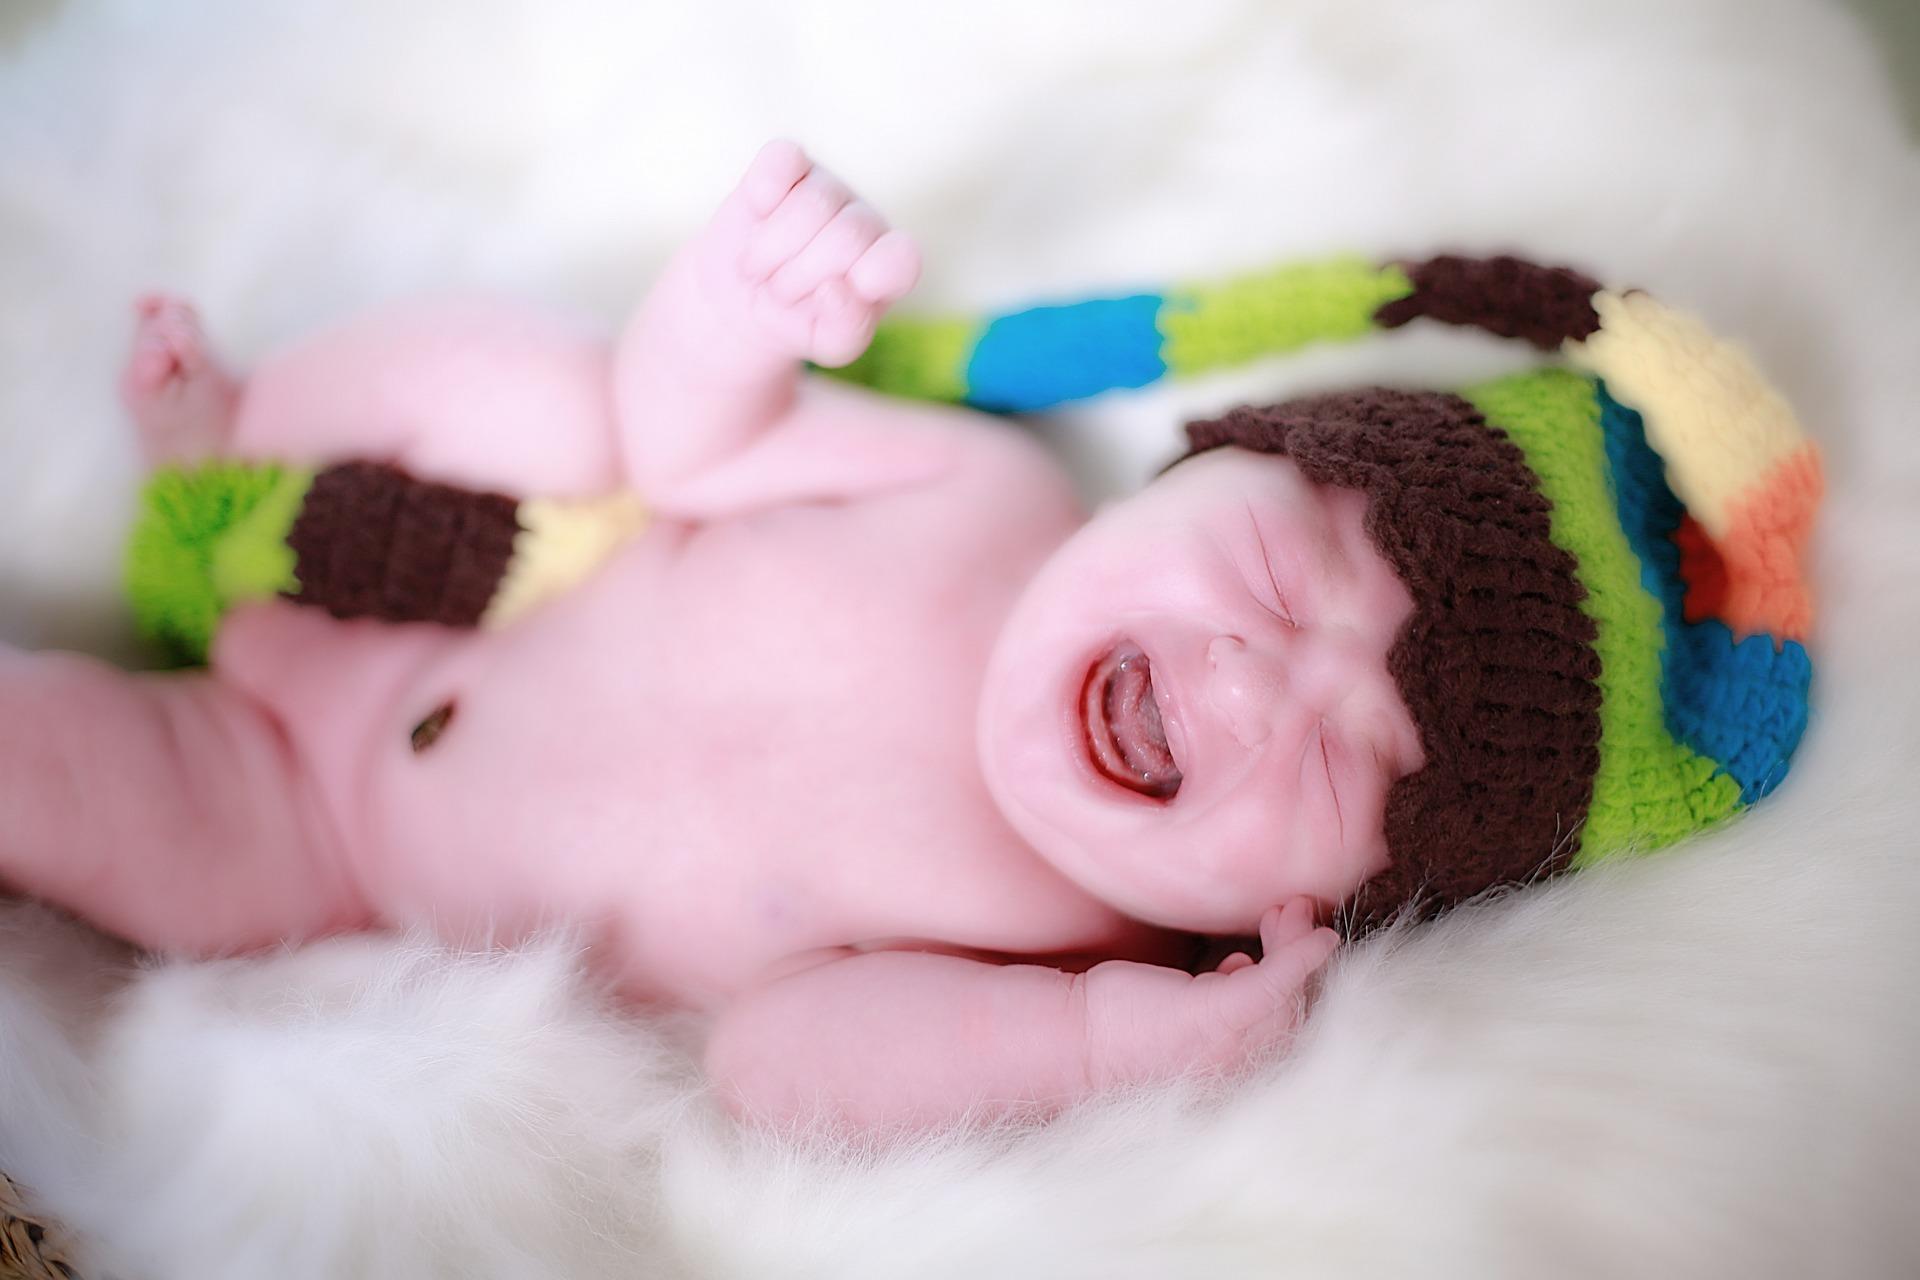 baby-1866246_1920.jpg